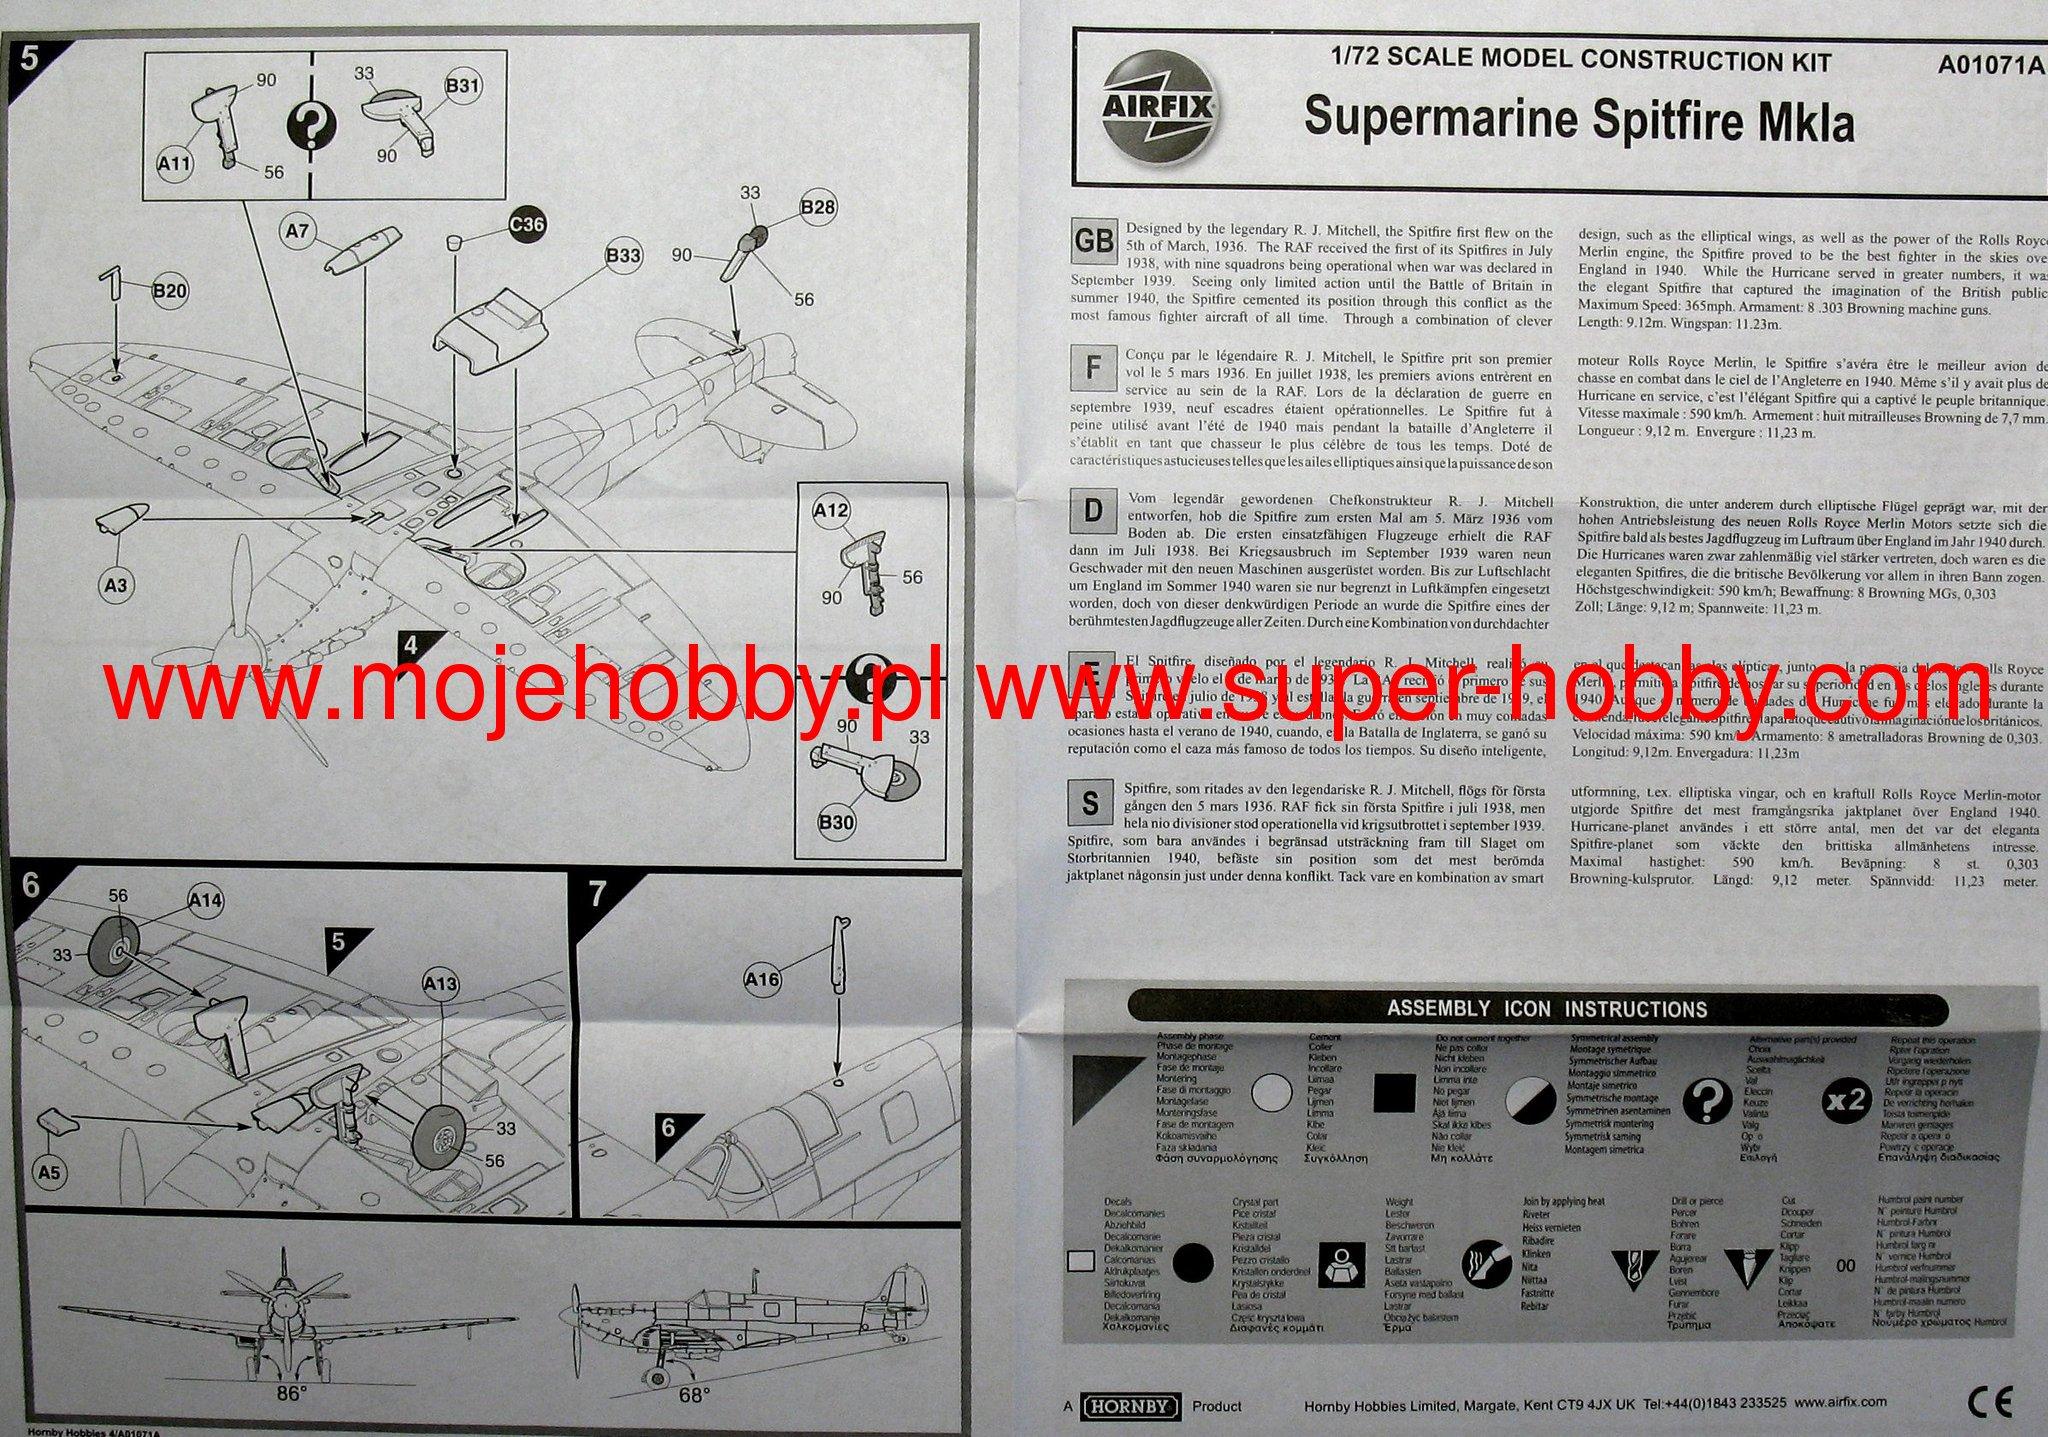 Supermarine Spitfire Mk1a Airfix 01071a Gt6 Mk1 Wiring Diagram 2 Afx01071a 1